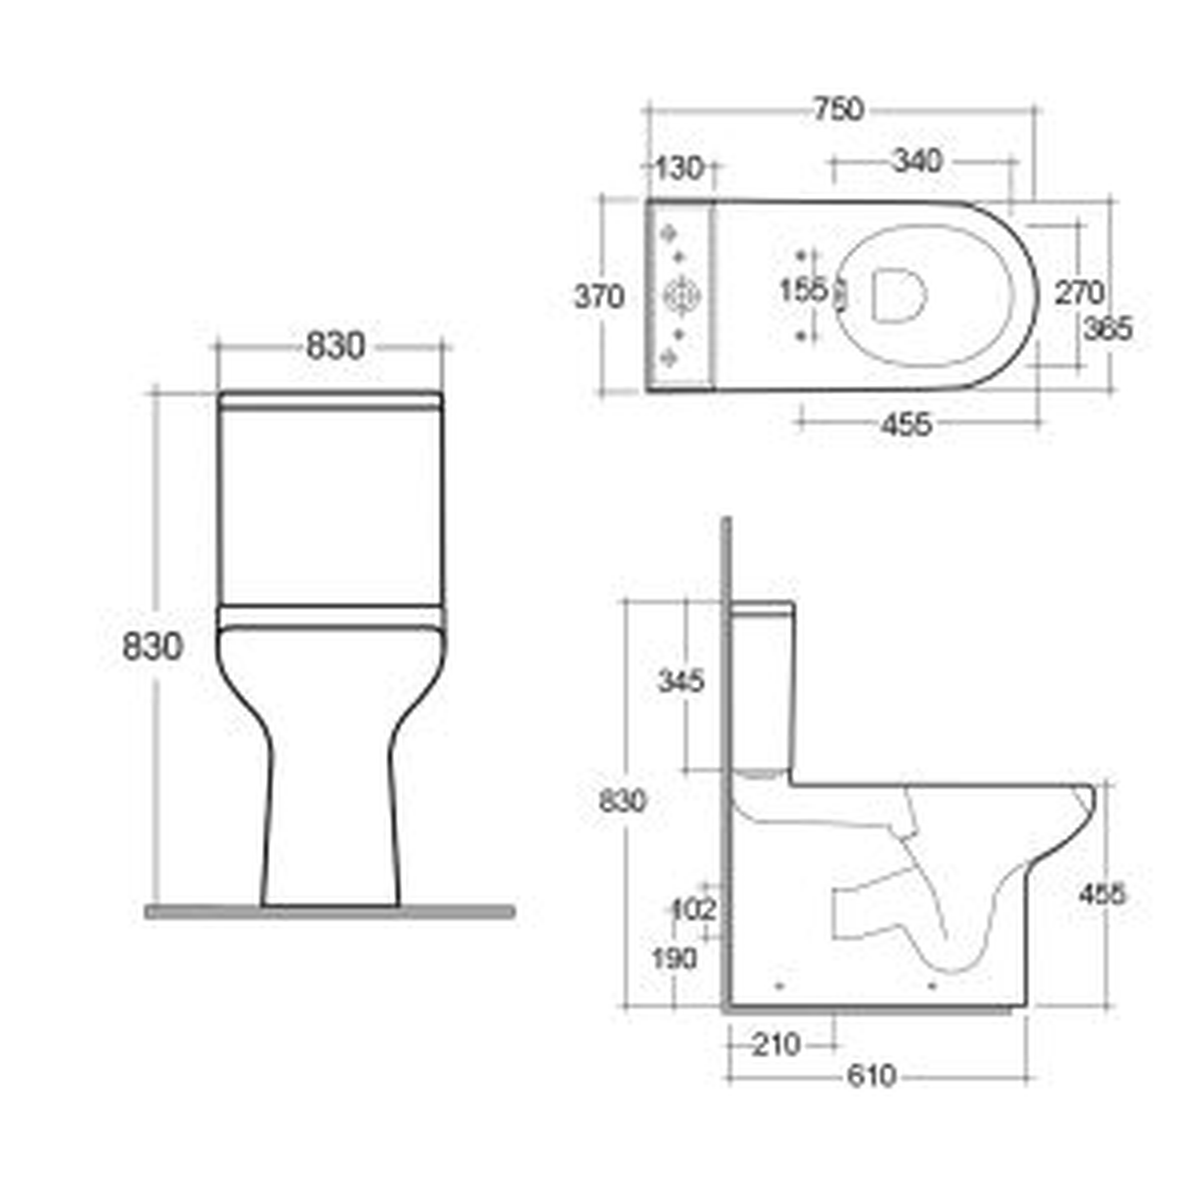 RAK Compact Special Needs Rimless Push Button Close Coupled Toilet Measurements